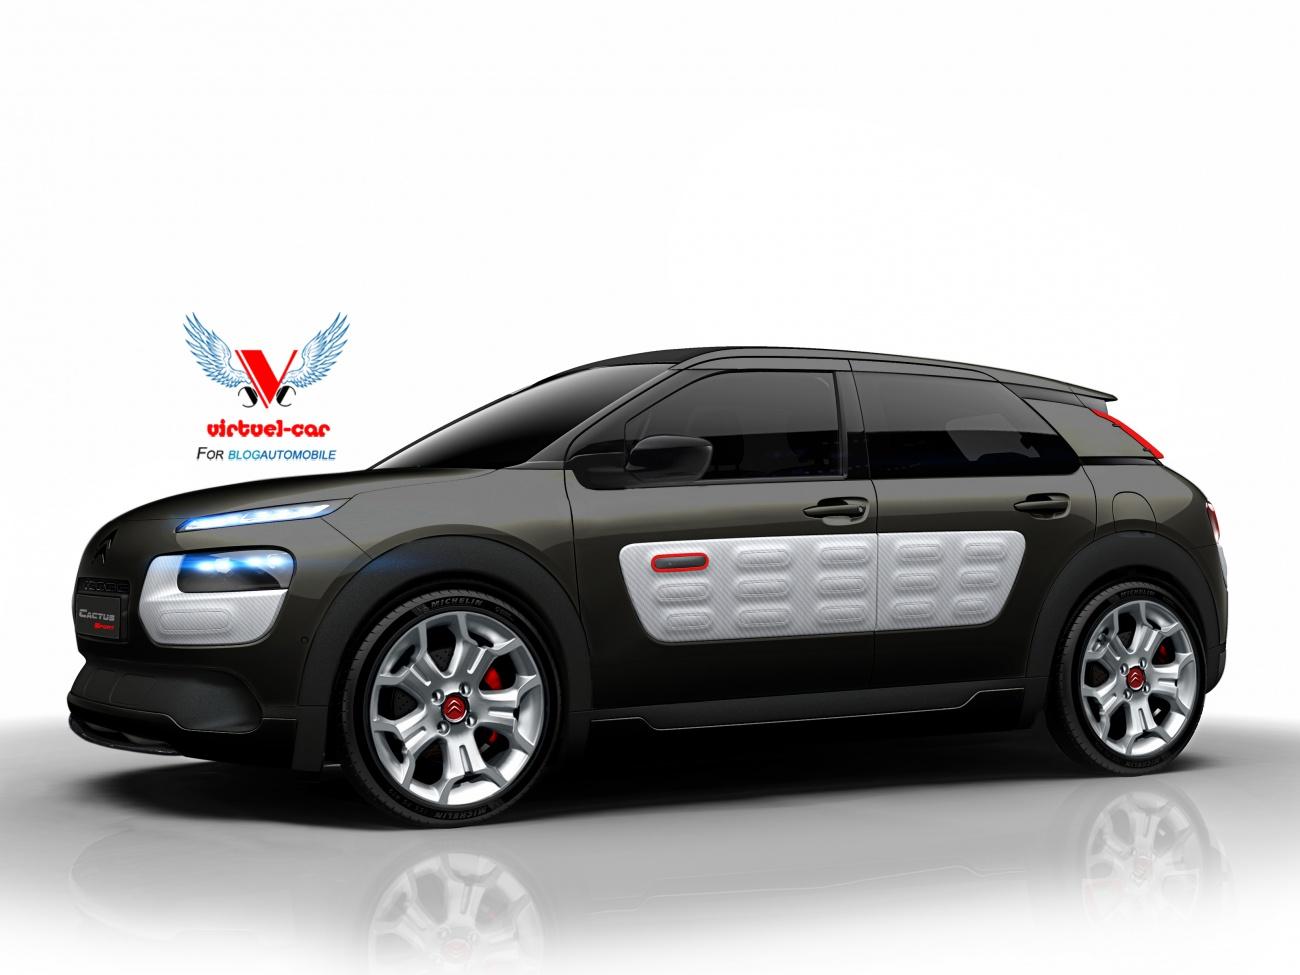 citro n c4 cactus sport attacks blog automobile. Black Bedroom Furniture Sets. Home Design Ideas